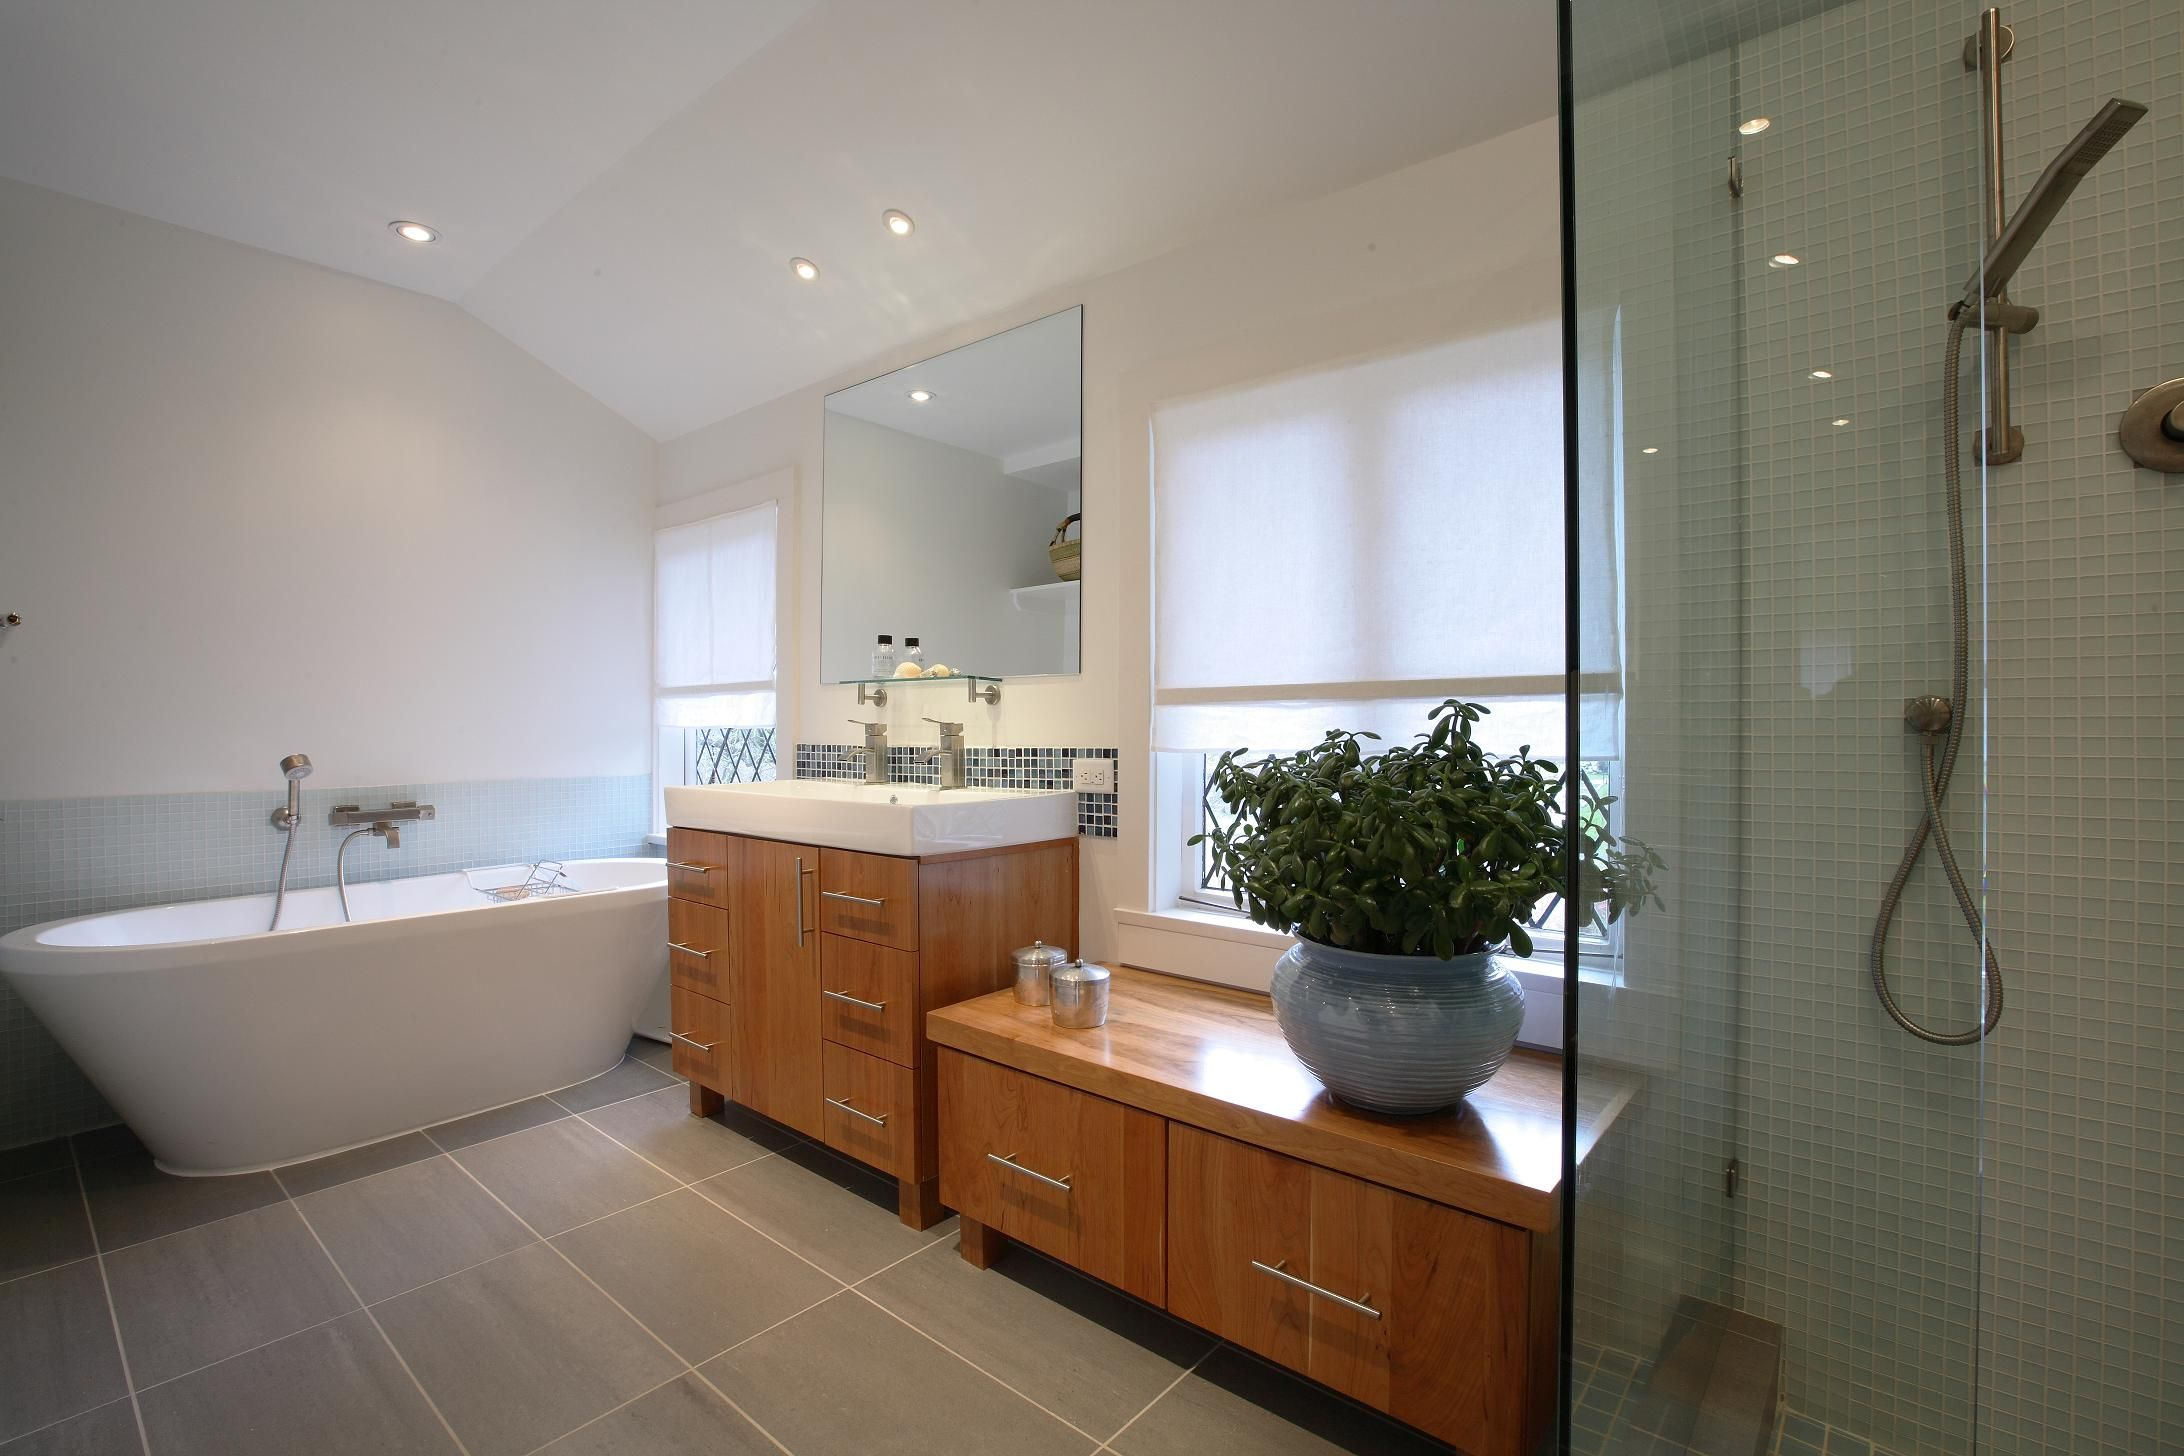 13 Best Bathroom Remodel Ideas & Makeovers Design